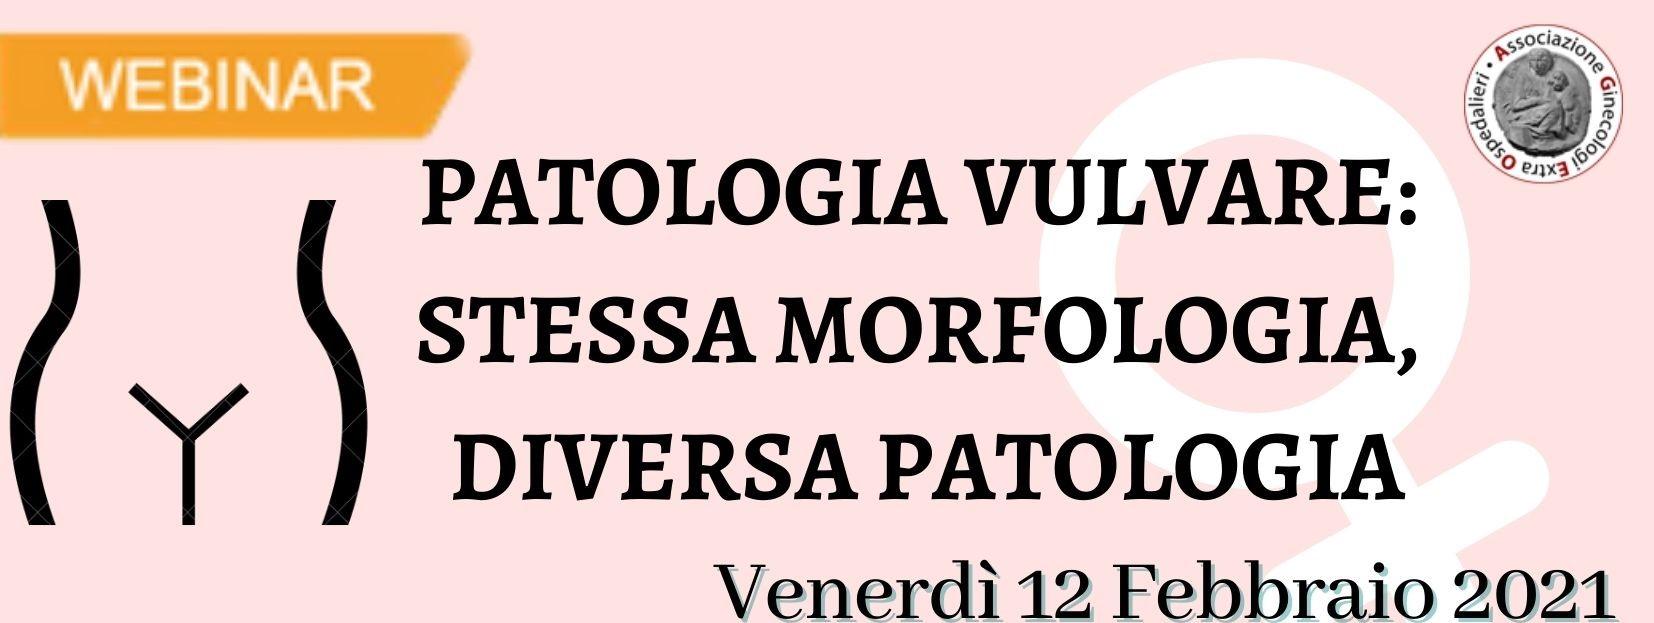 Patologia vulvare: stessa morfologia, diversa patologia